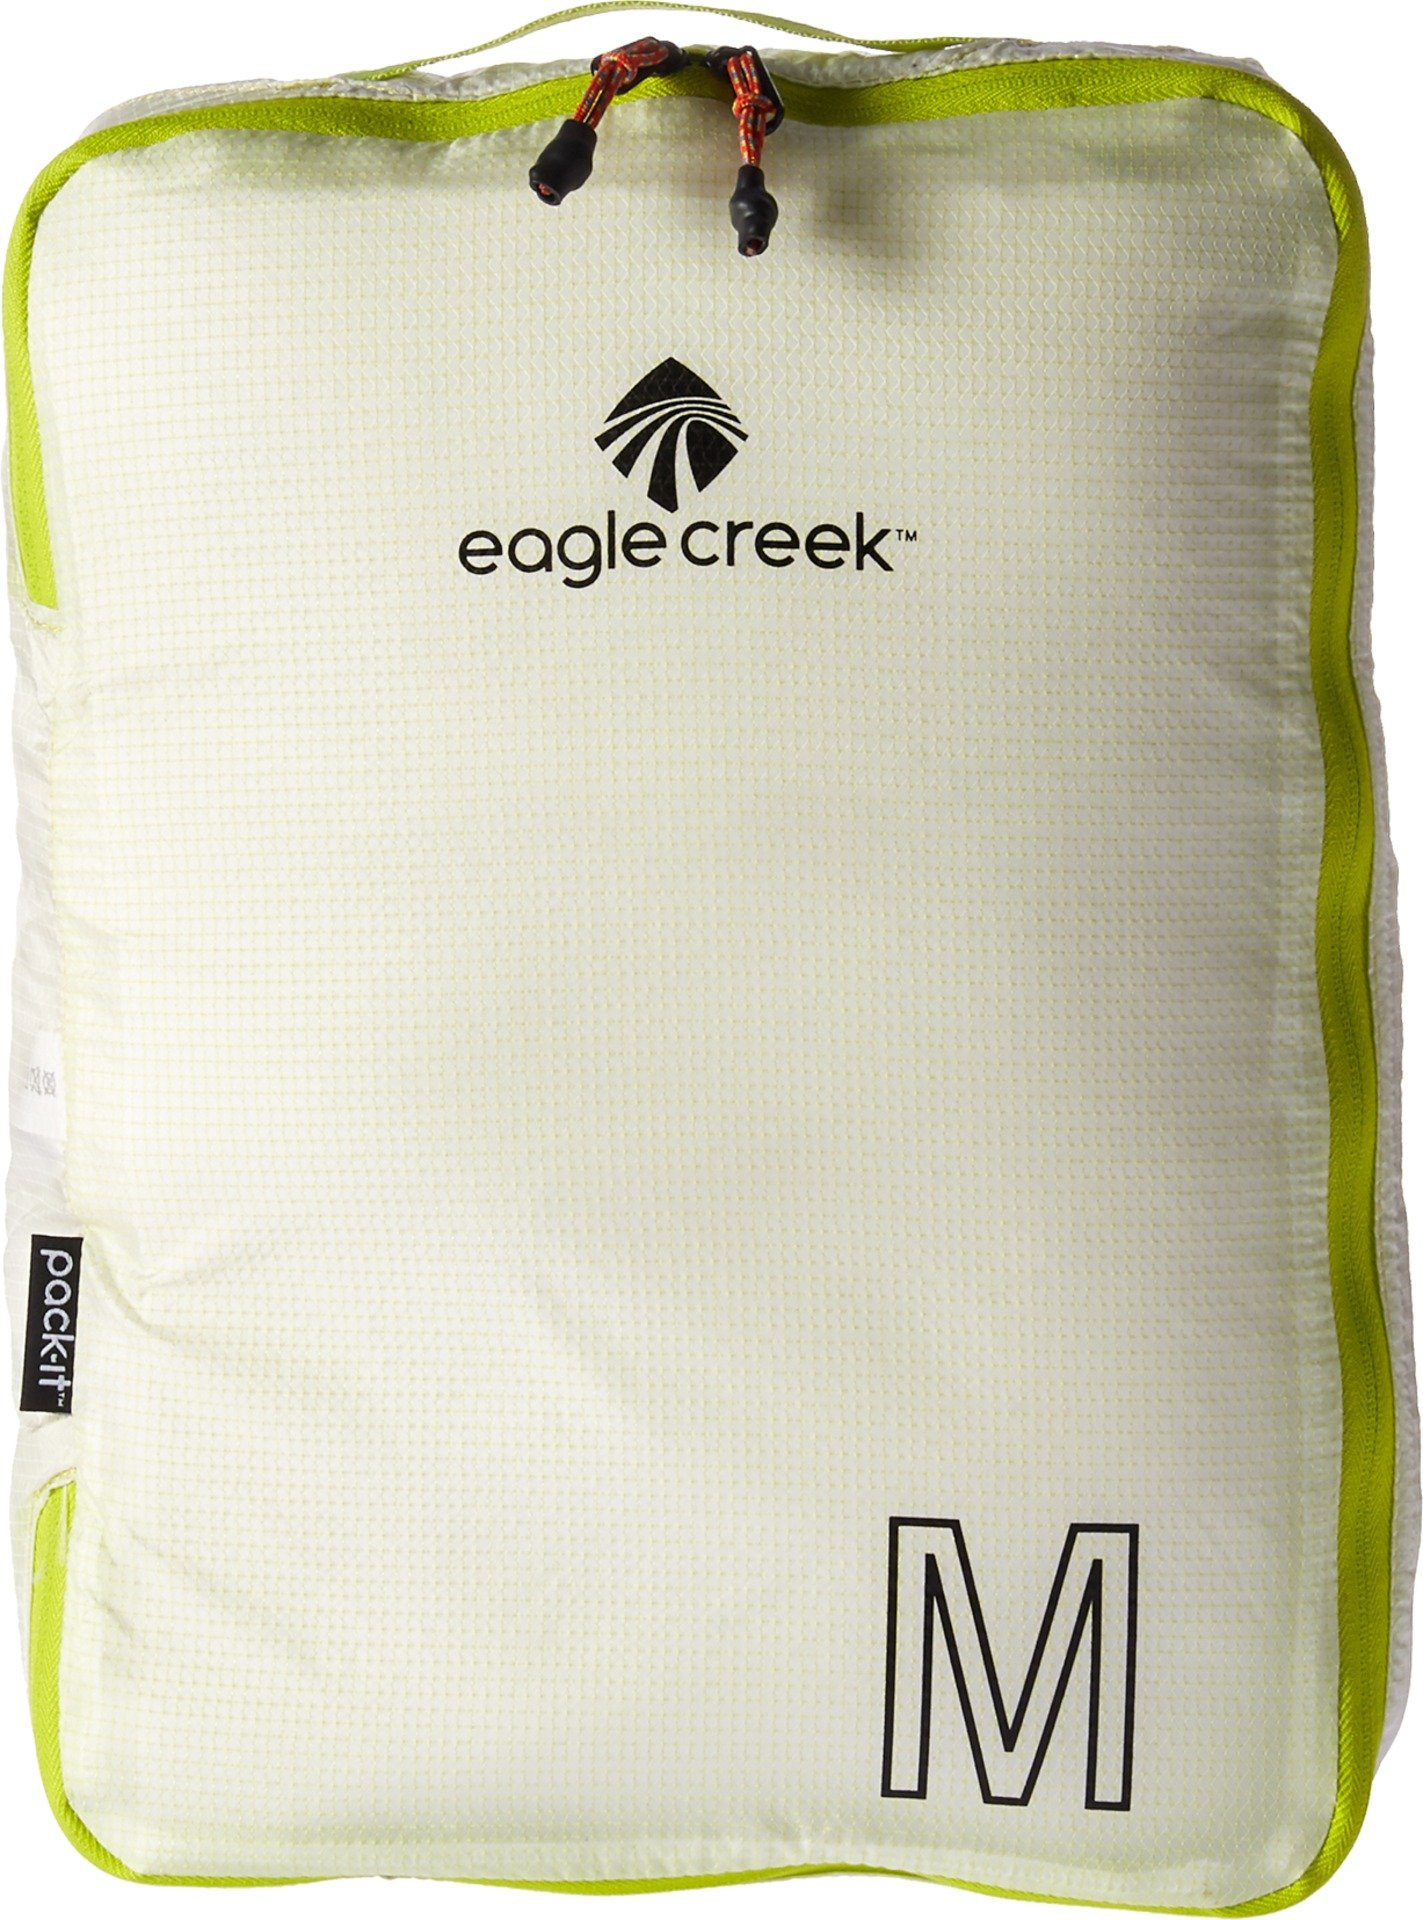 Eagle Creek Unisex Pack-It Specter Tech¿ Cube Set XS/S/M White/Strobe One Size